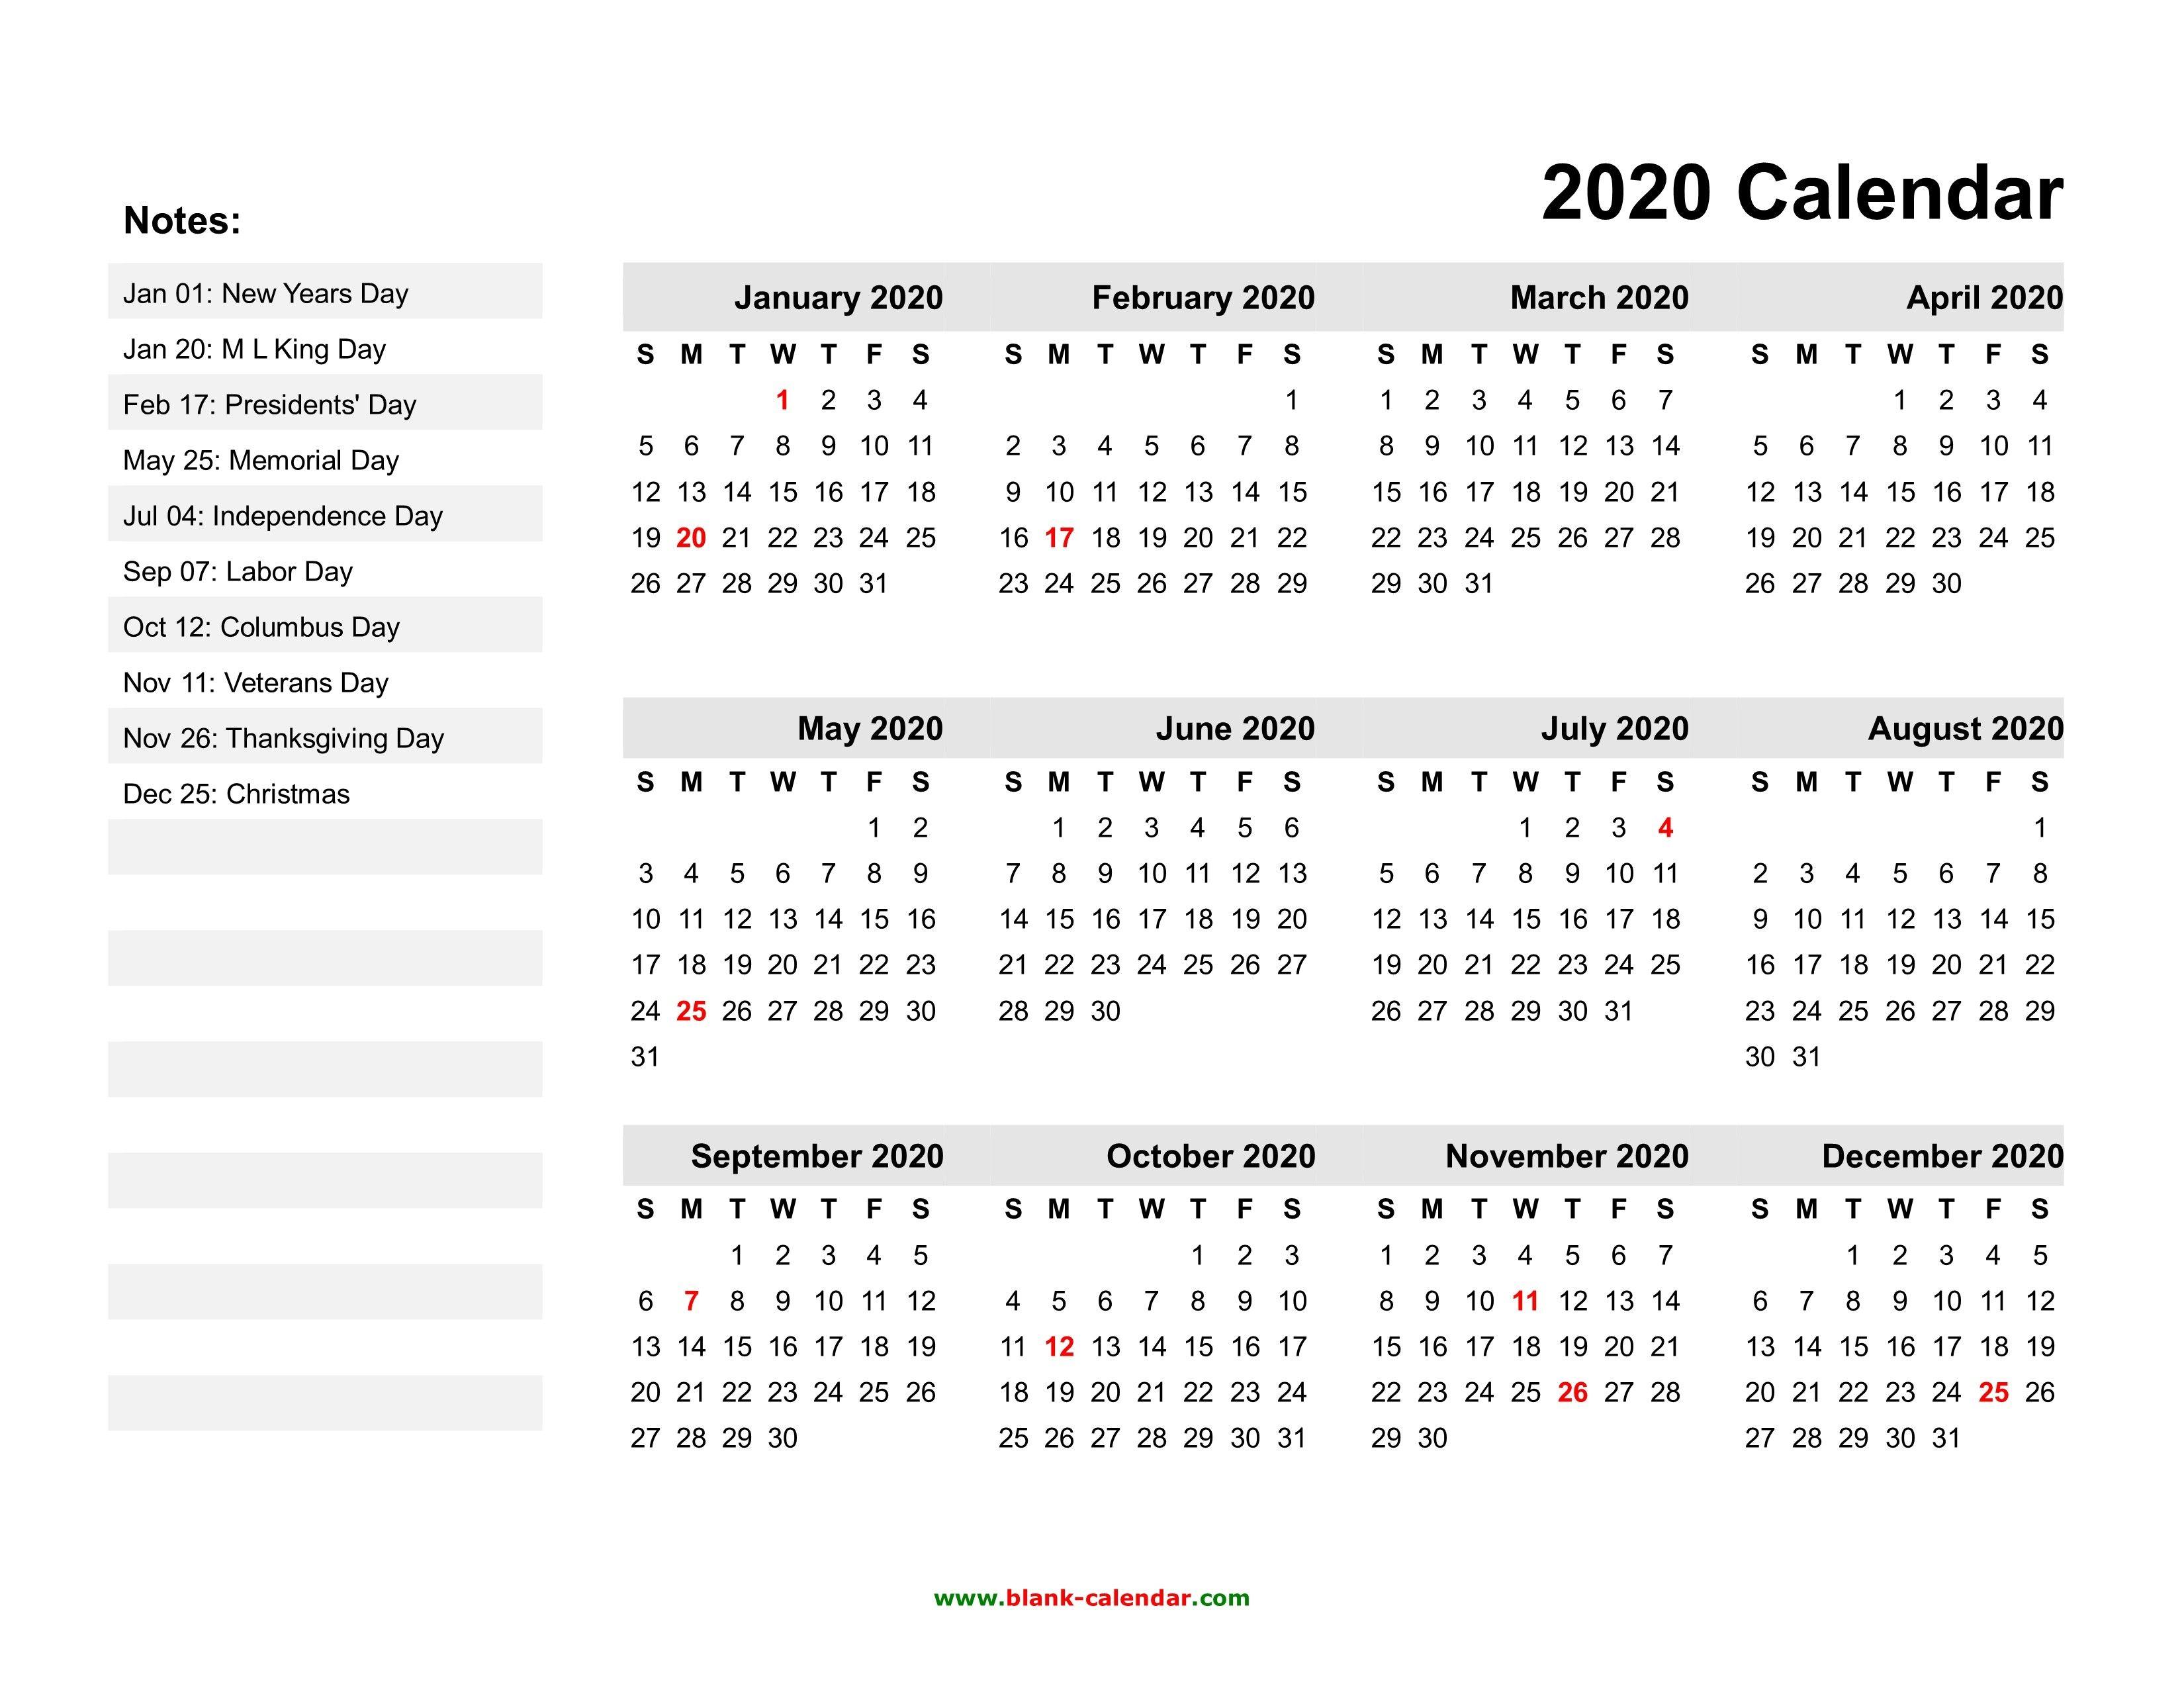 Free Printable 2020 Calendars With Holidays – Pleasant To My with 2020 Calendar With Holidays Printable Free